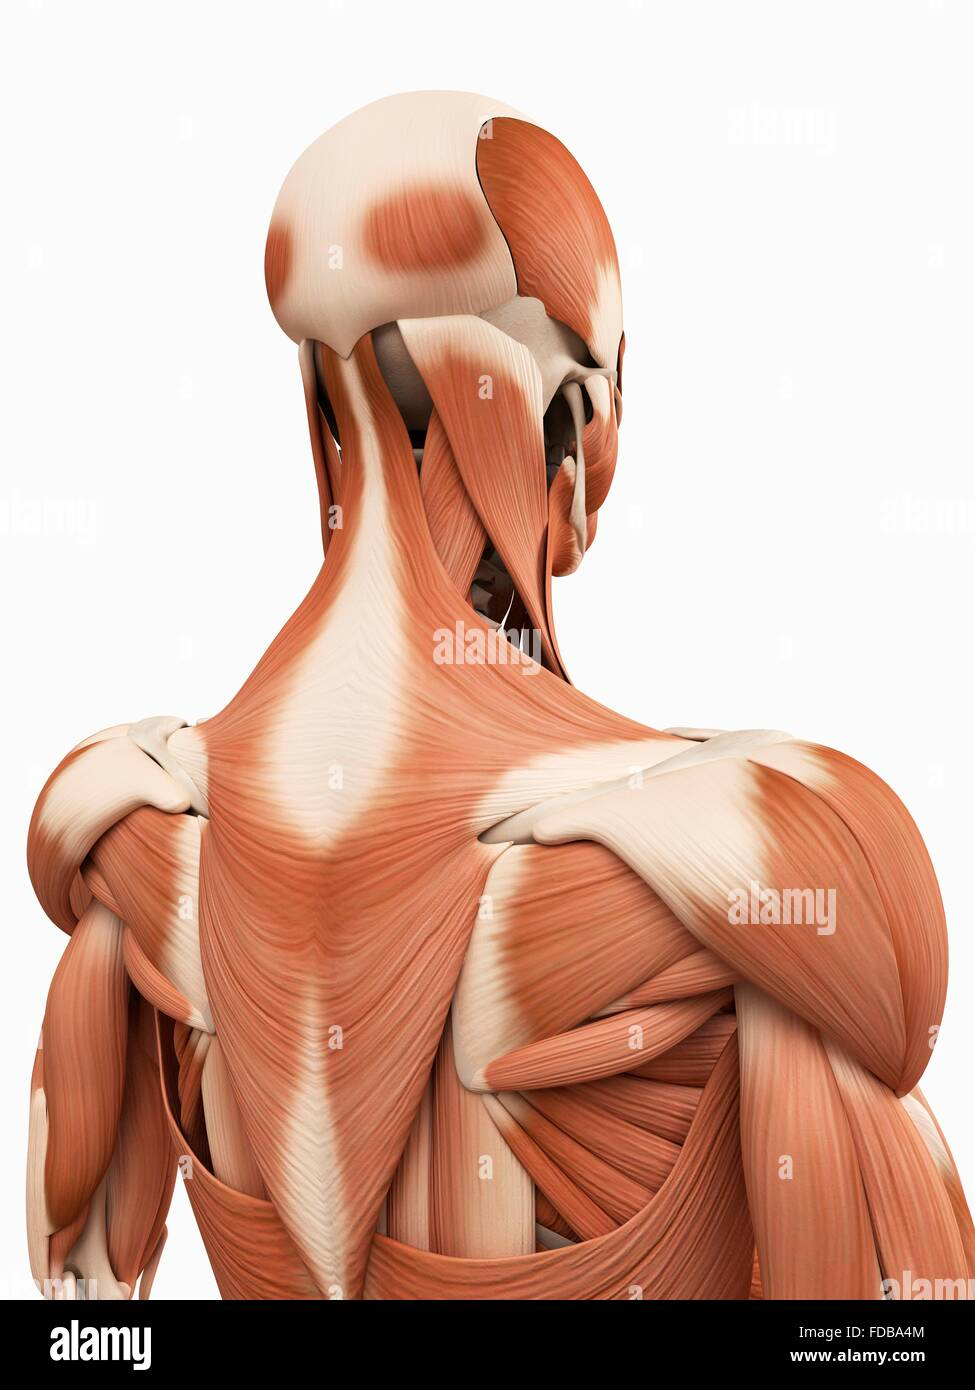 Muskulatur des oberen Rückens, Abbildung Stockfoto, Bild: 94291812 ...